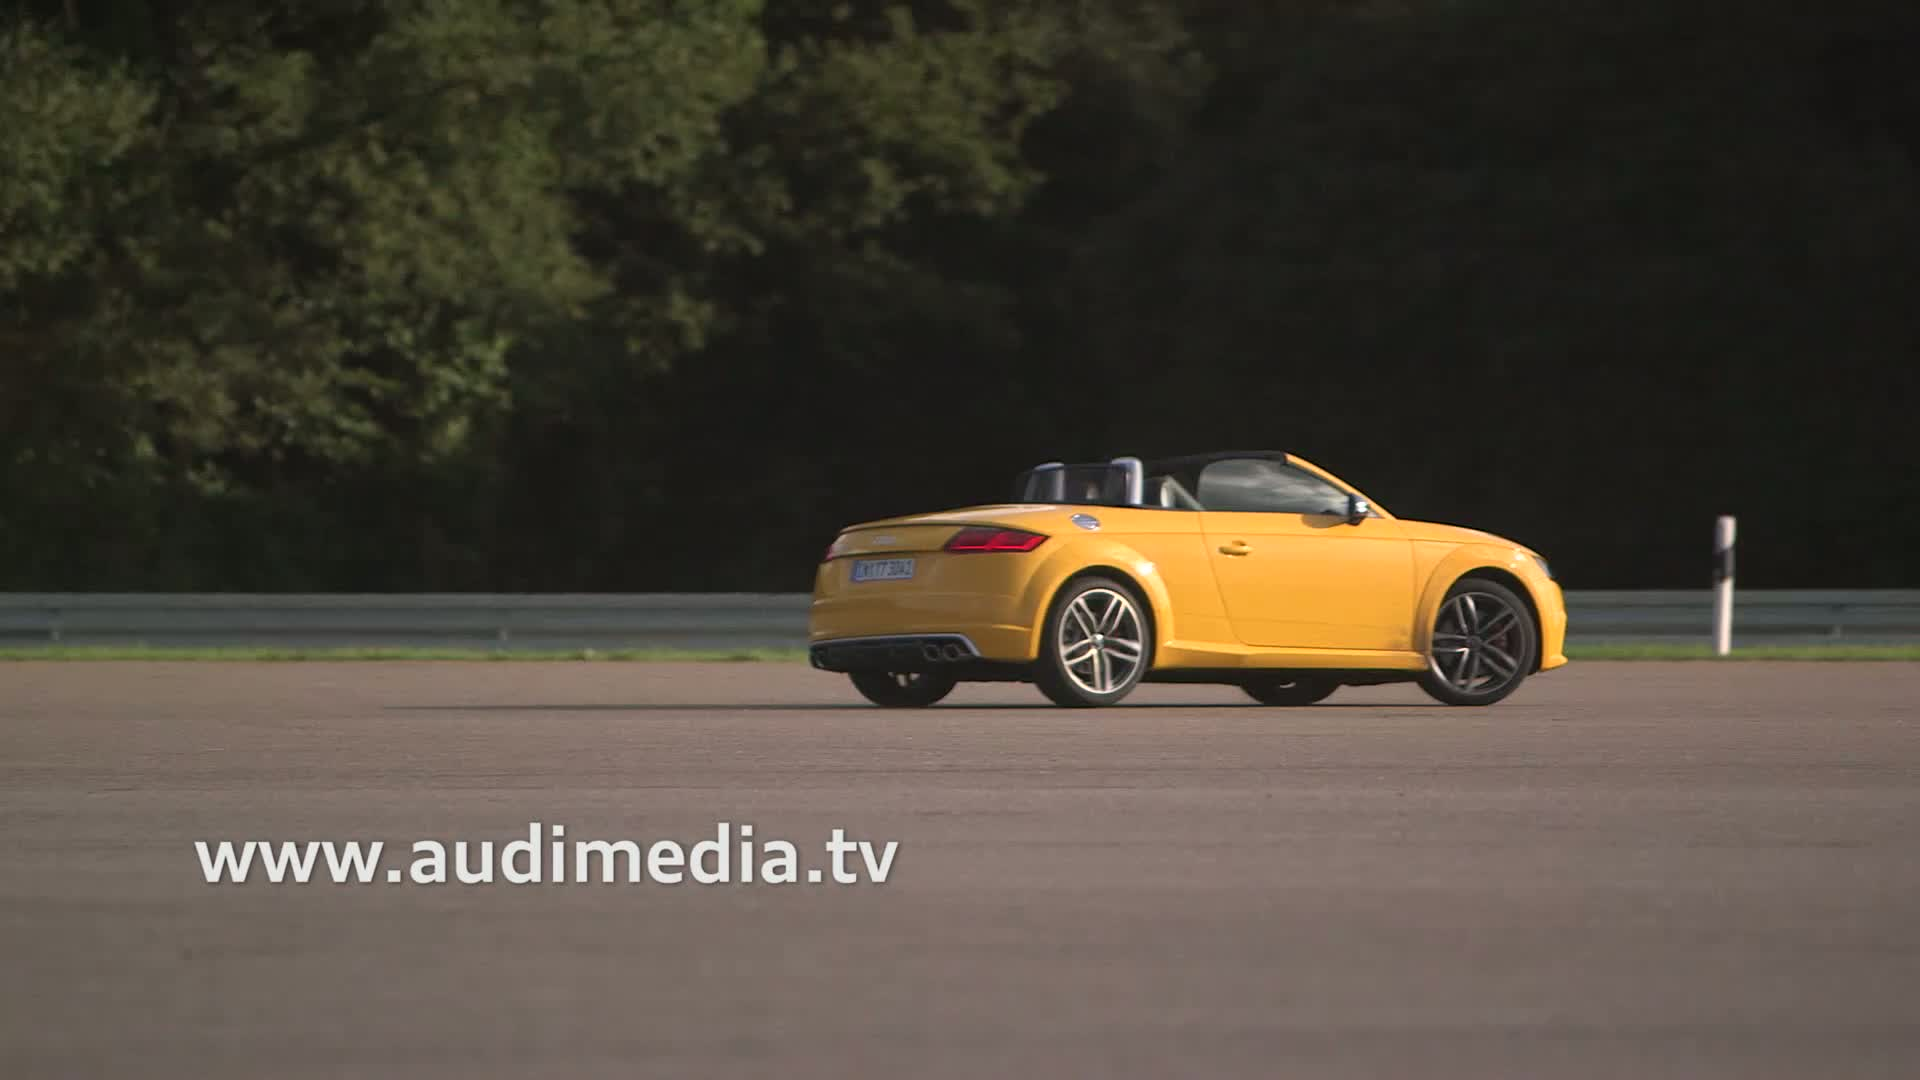 Exklusiver Fahrbericht: Der neue Audi TTS Roadster - Teaser